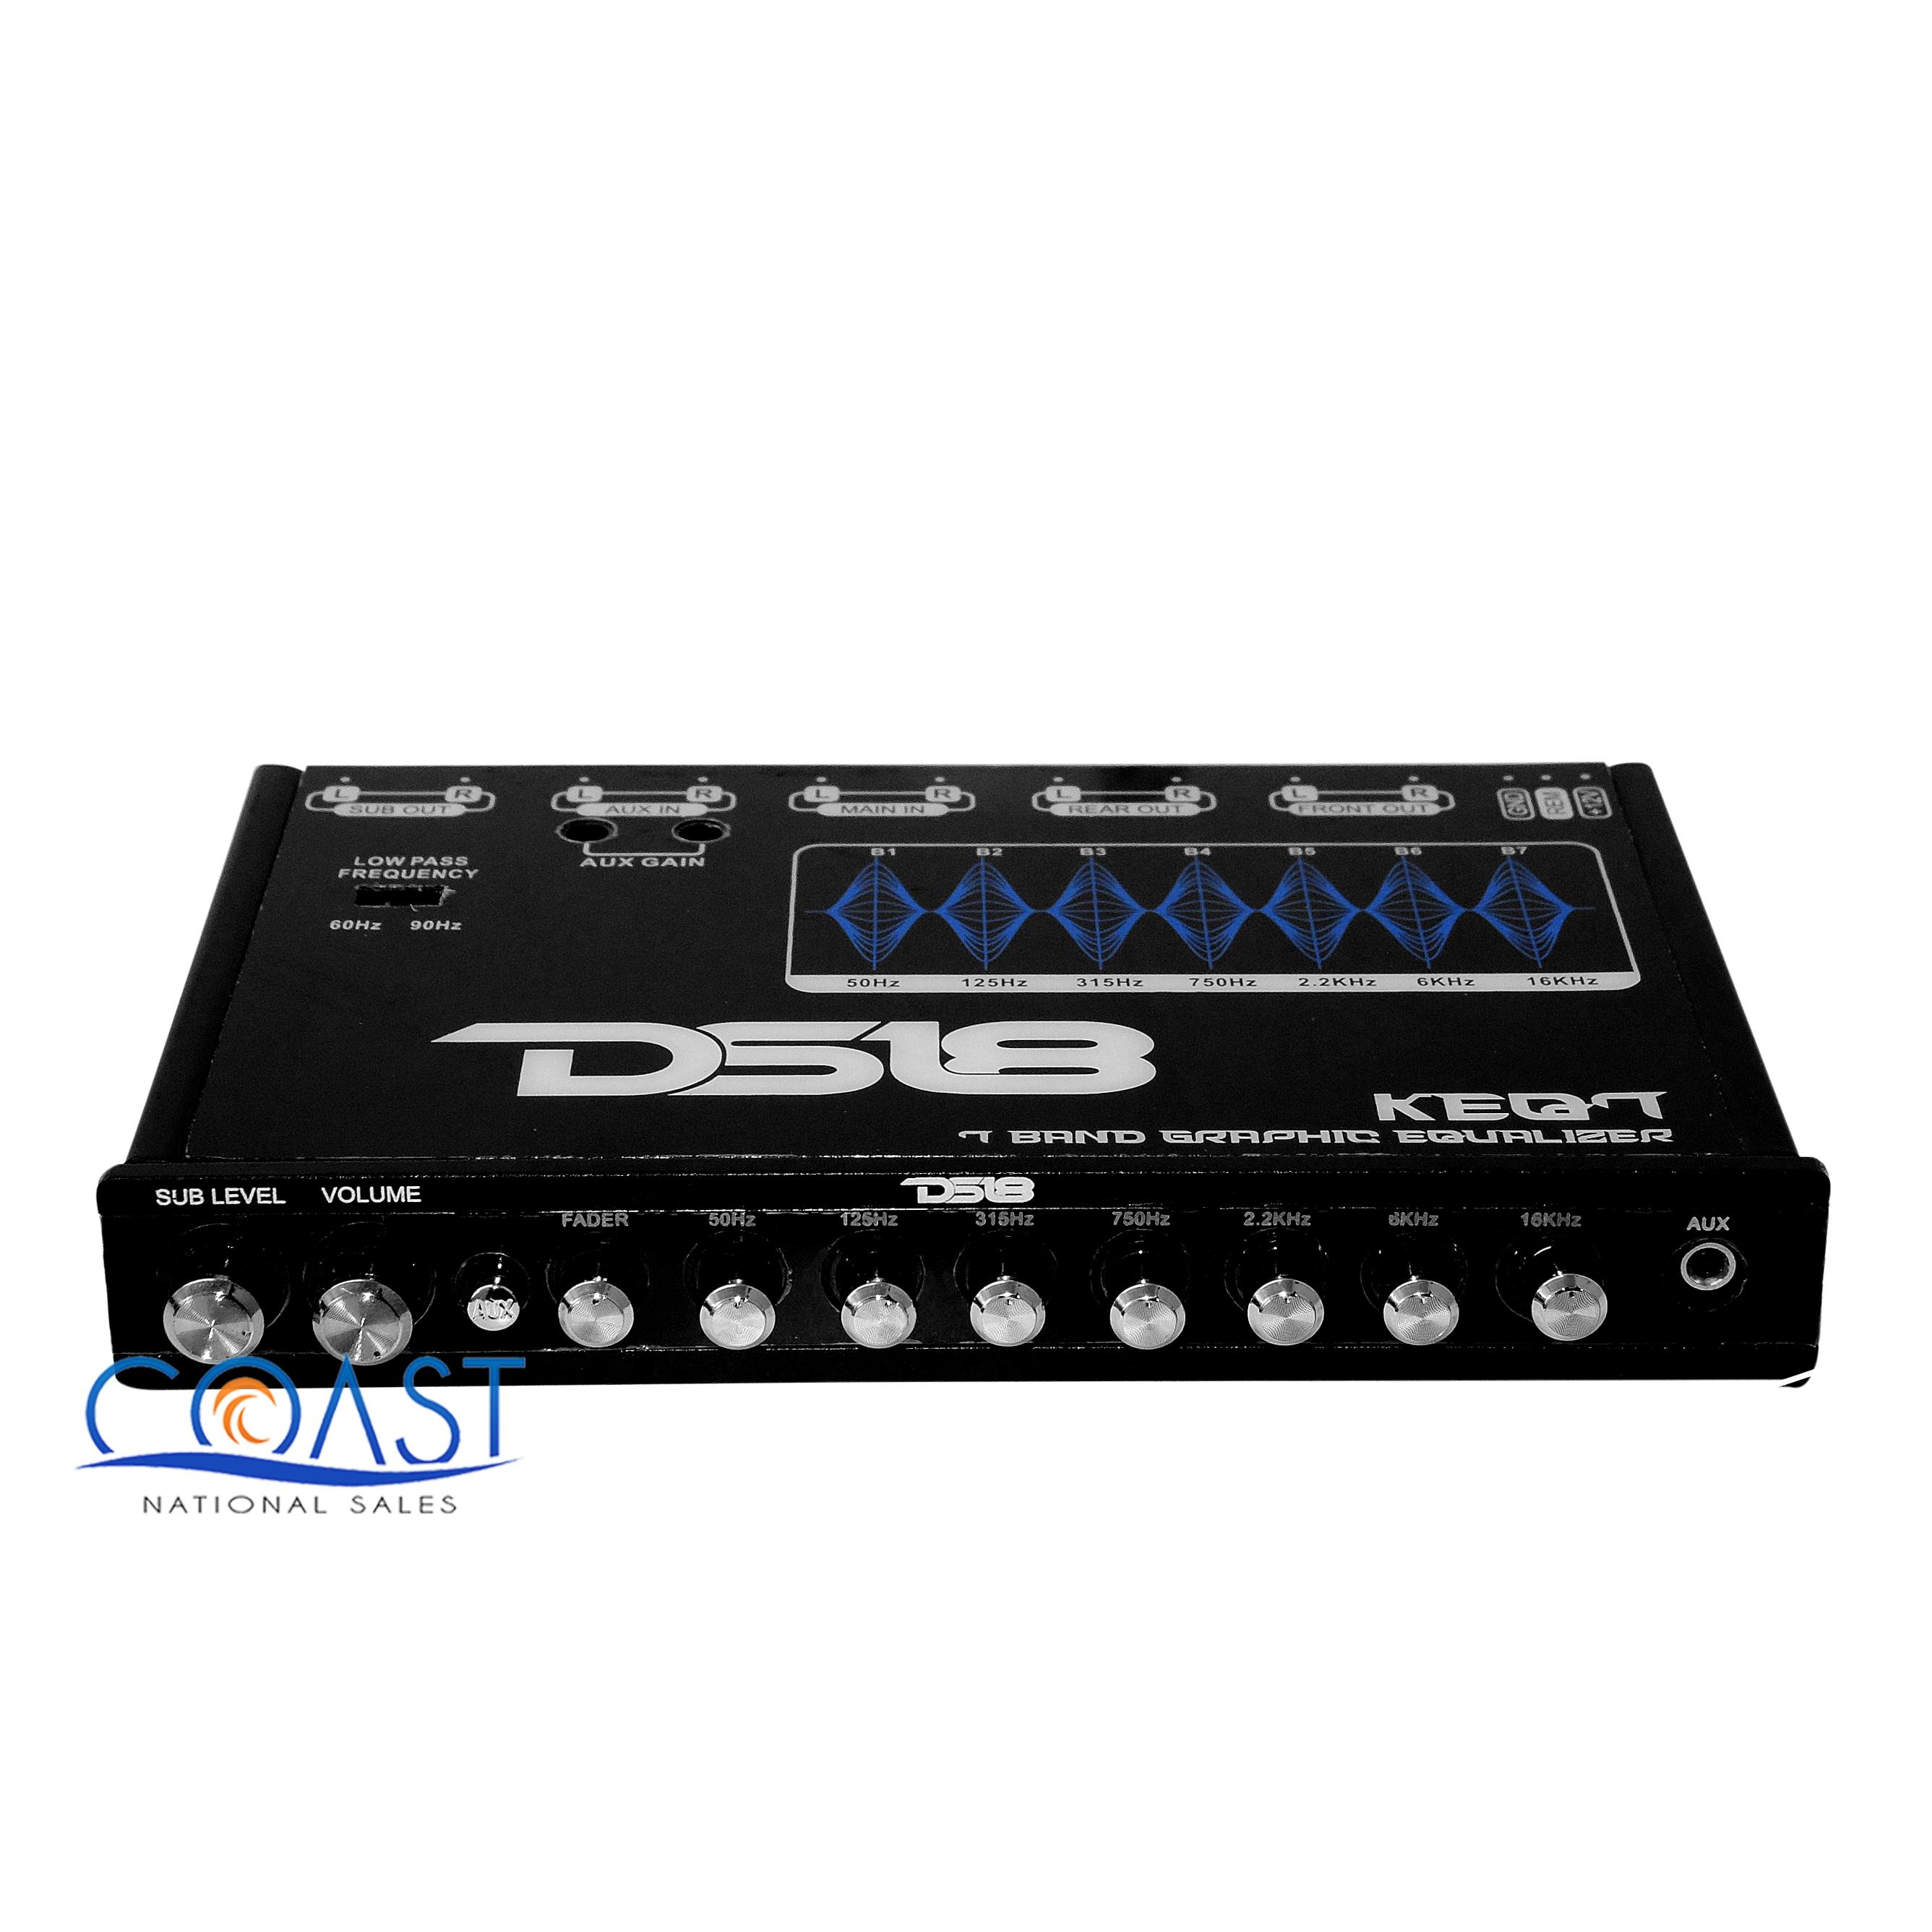 Details About Car Audio 6 Channel 7 Band Graphic Equalizer Car Audio Subwoofer Aux Ds18 Keq7